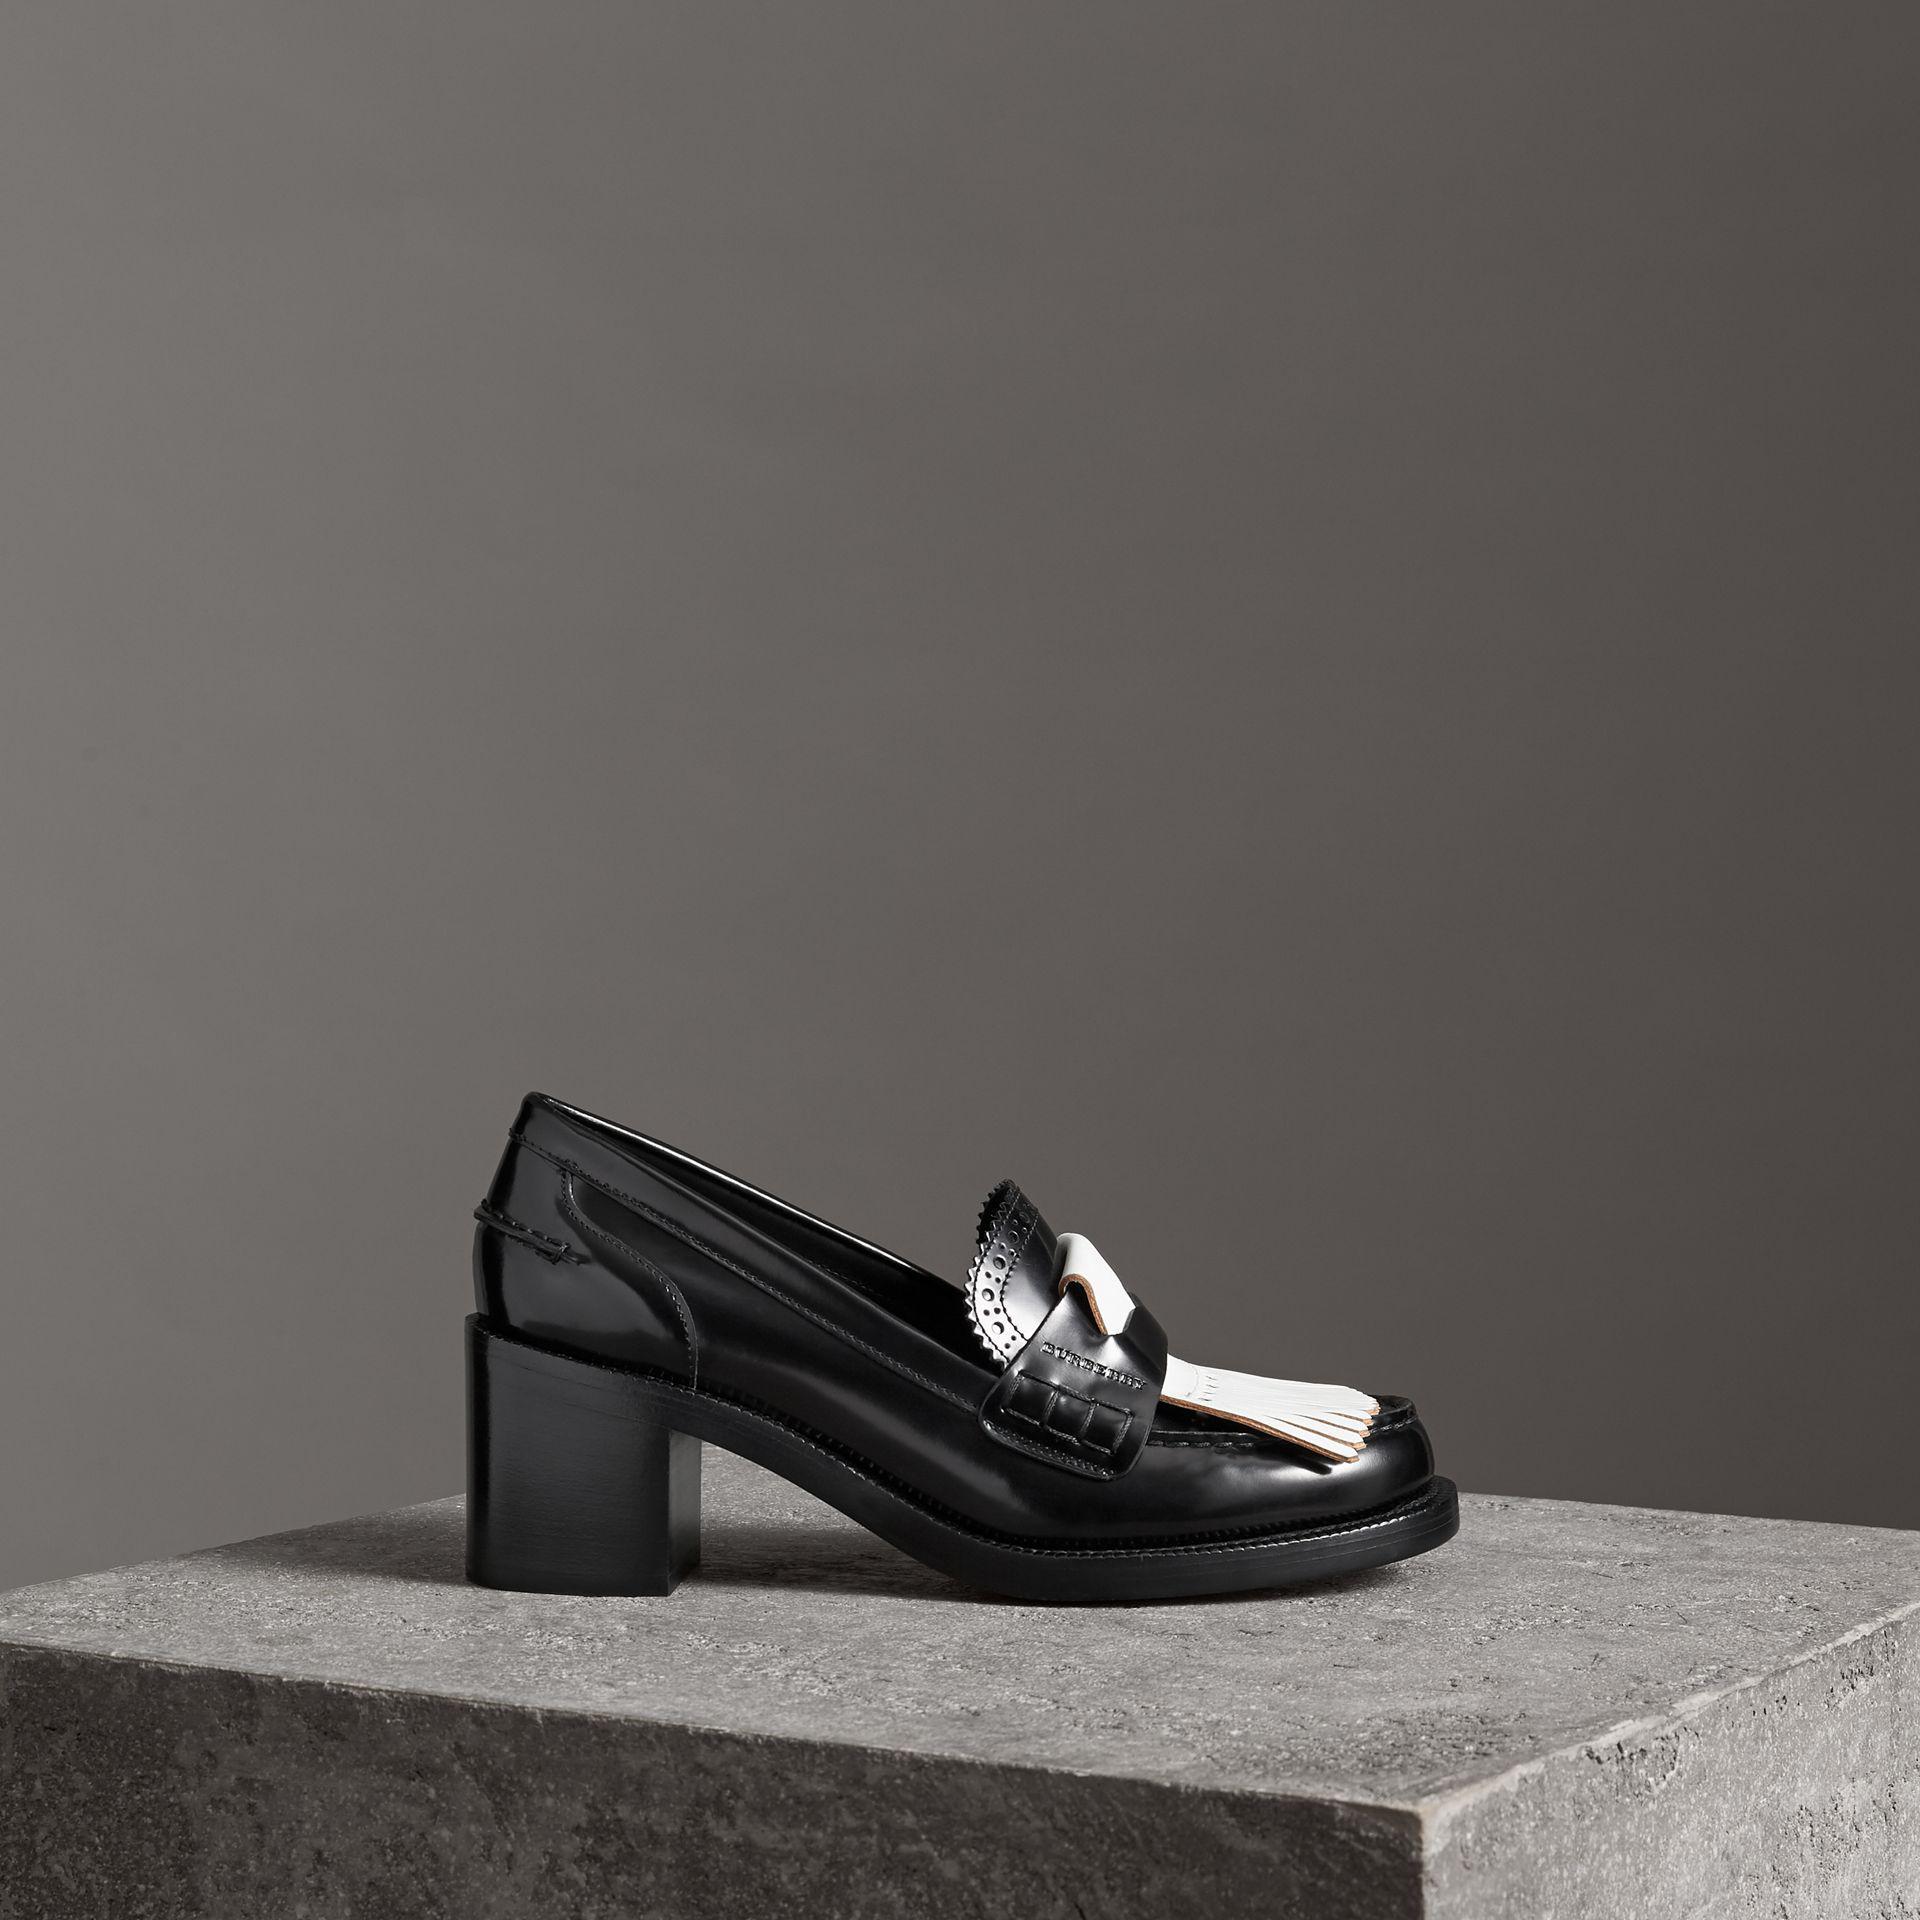 4b8fbeedc2bc9 Lyst - Burberry Contrast Kiltie Fringe Leather Block-heel Loafers in ...